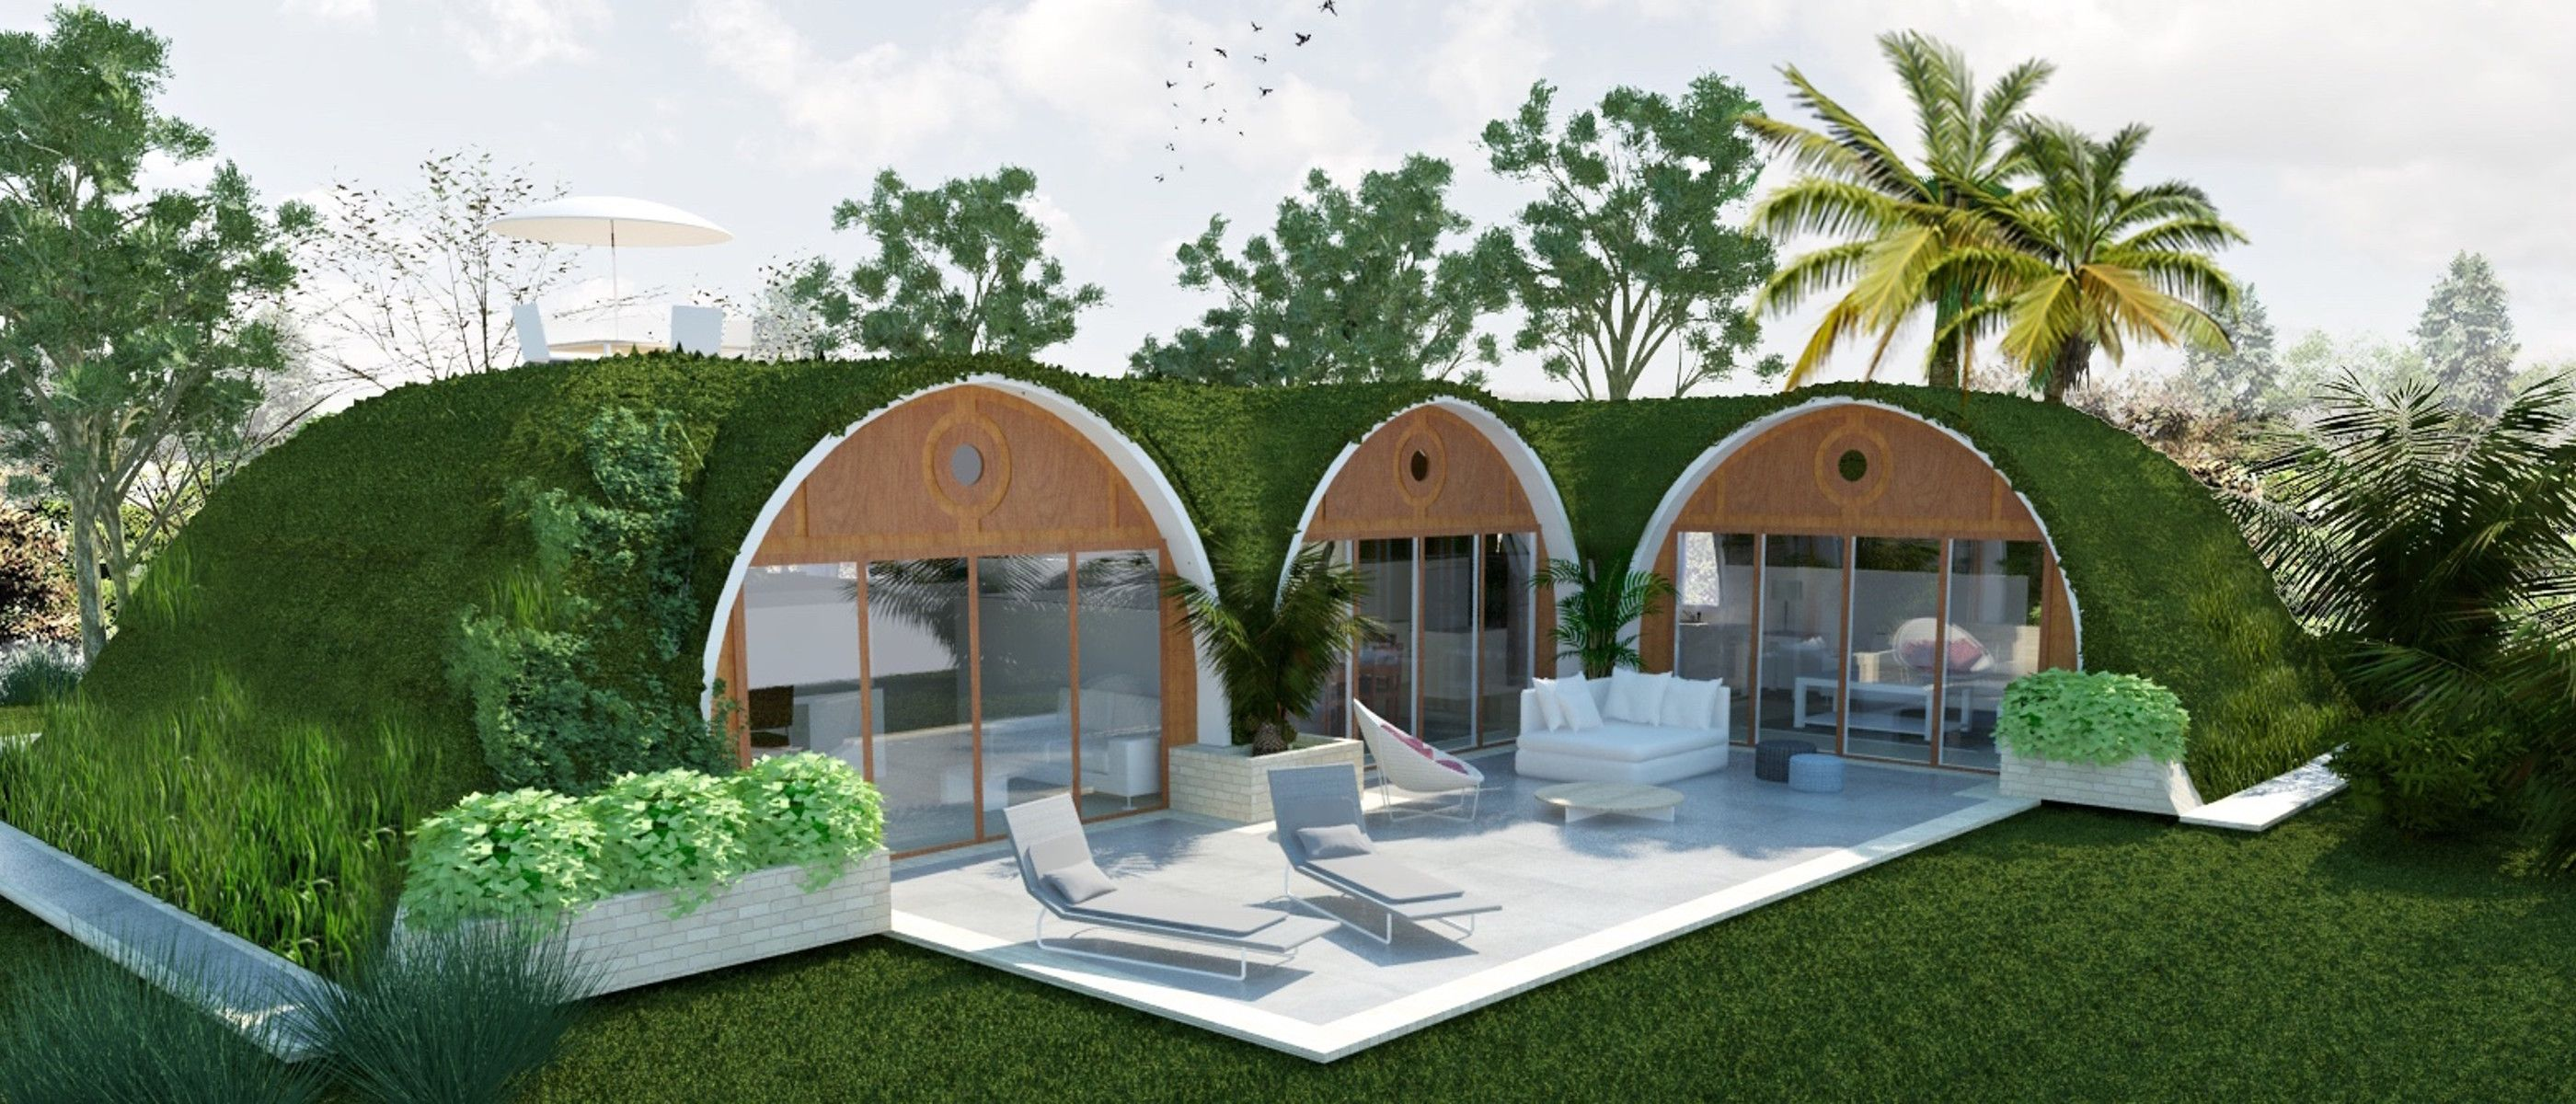 Green magic homes! Modular house under grass, gardens, sand, or ...